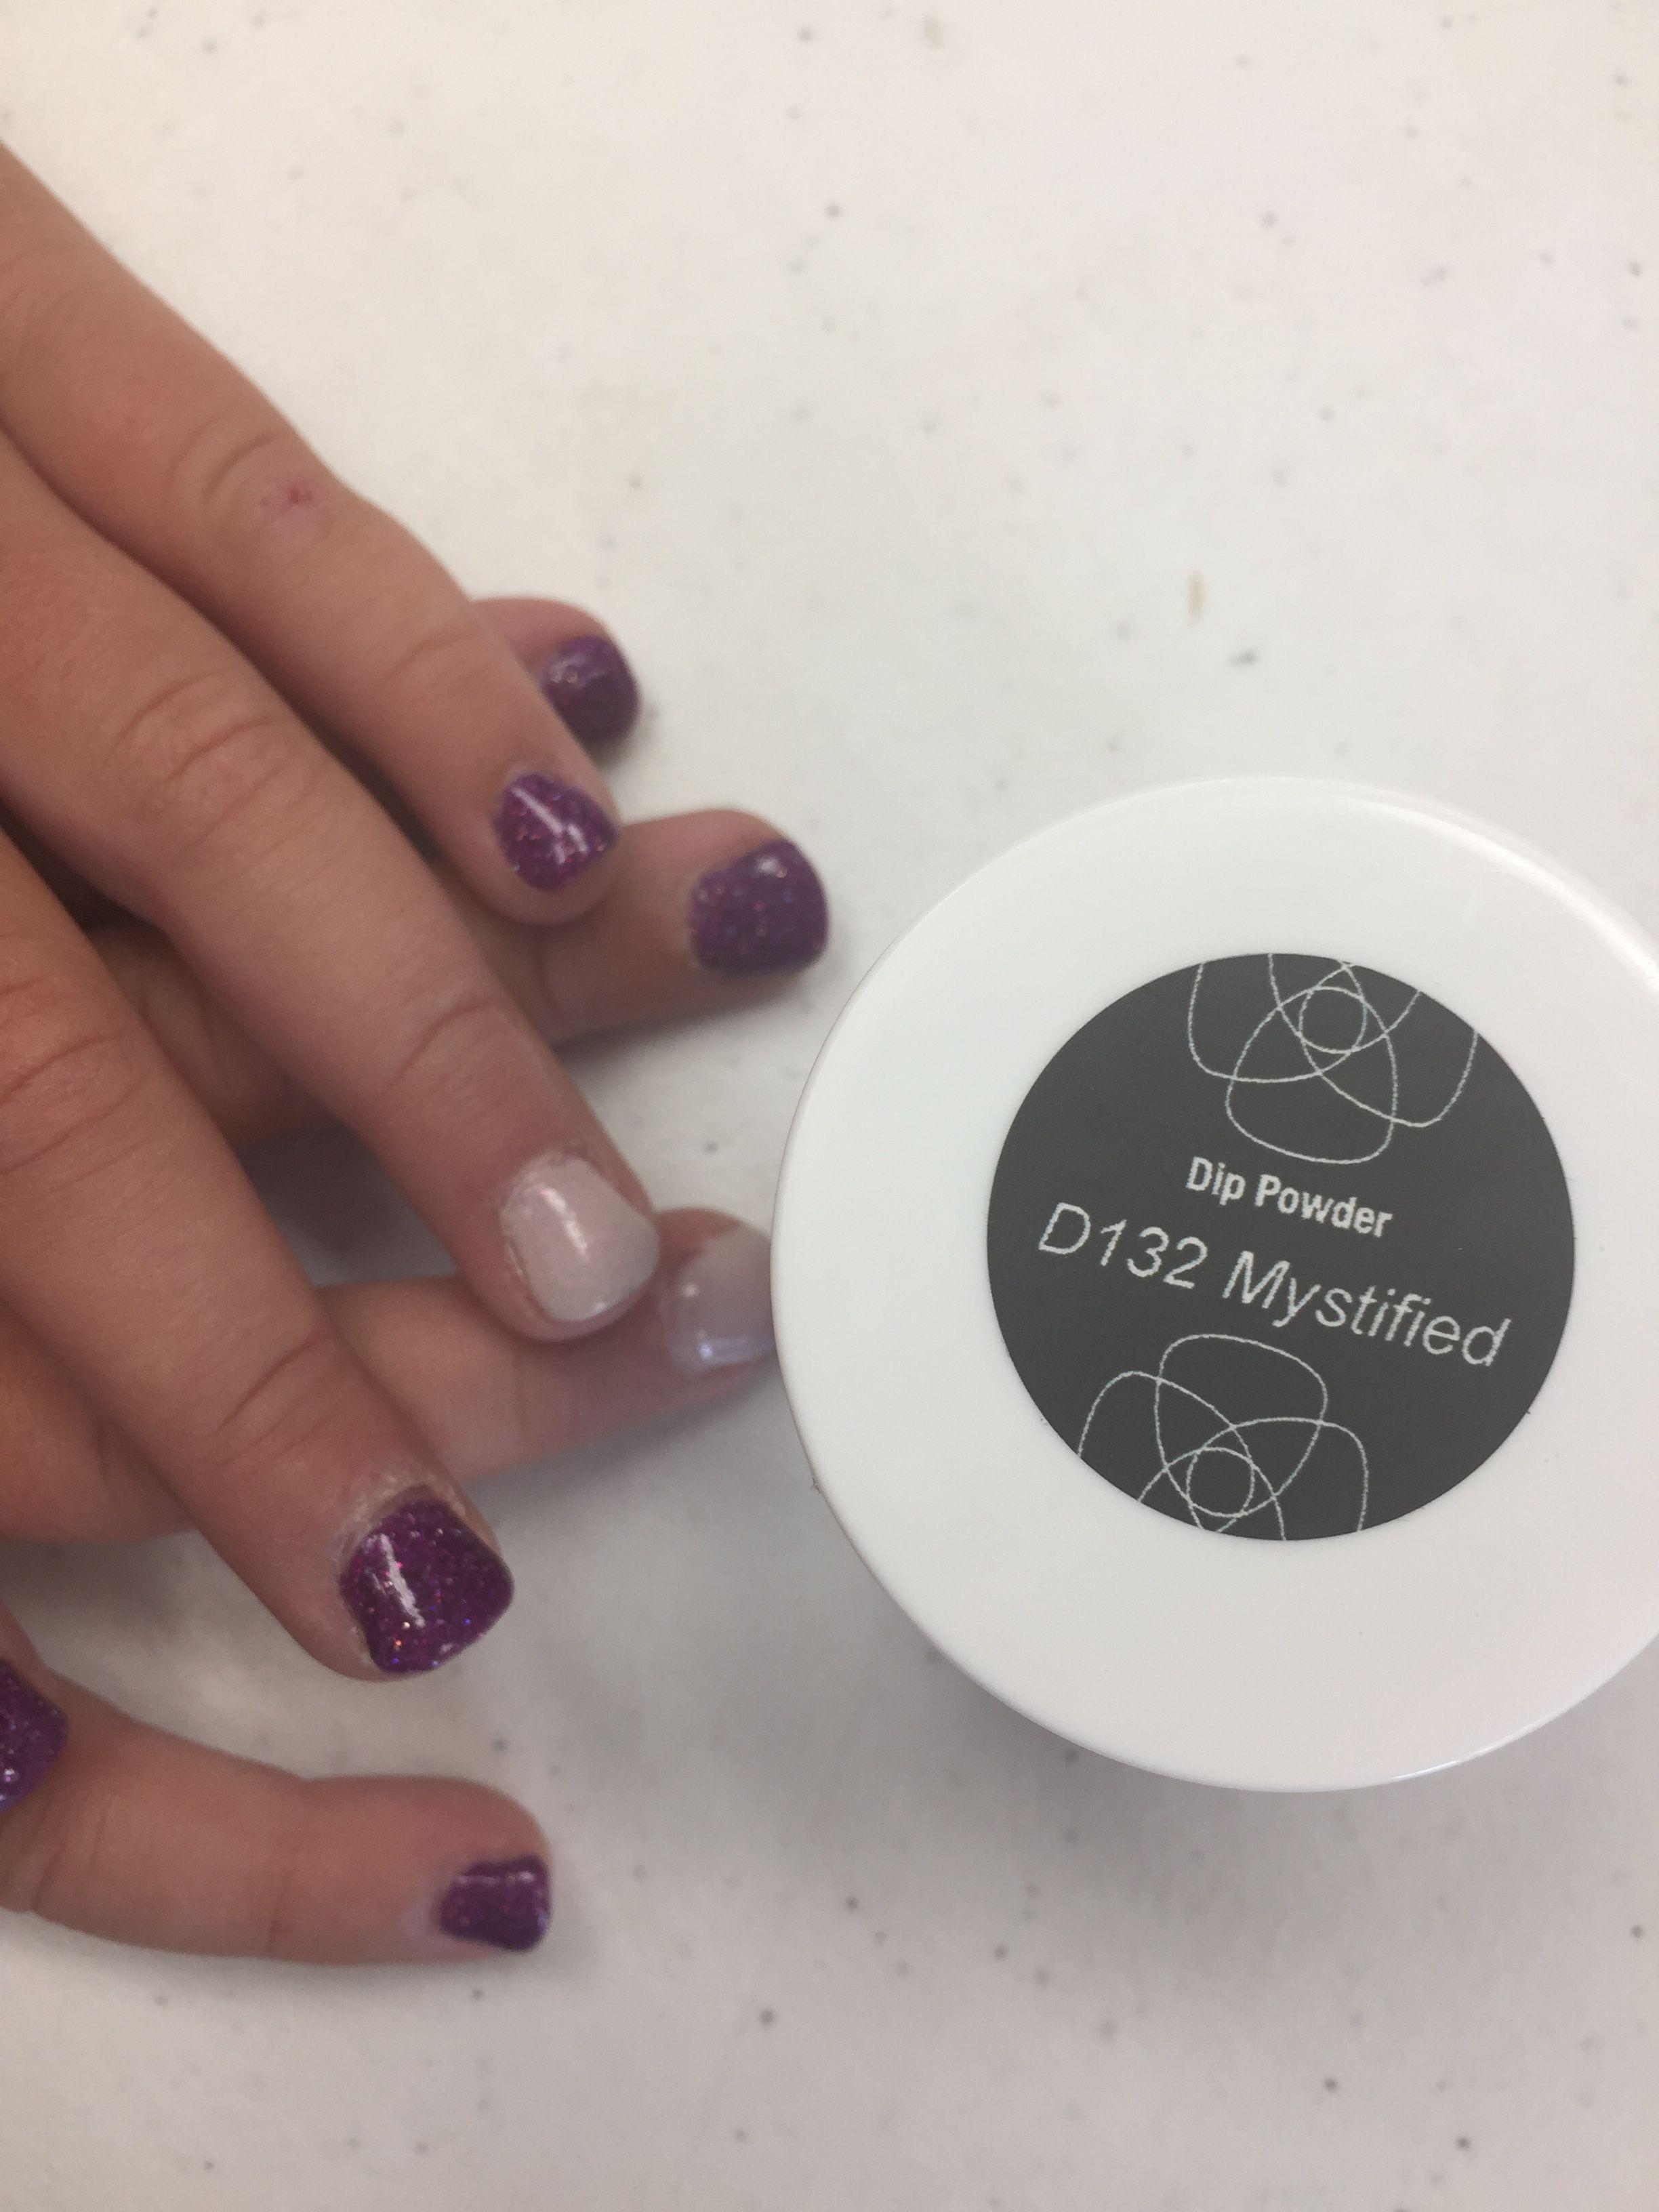 Revel nail dip powder: Mystified and Austrinus | Revel nail dip ...